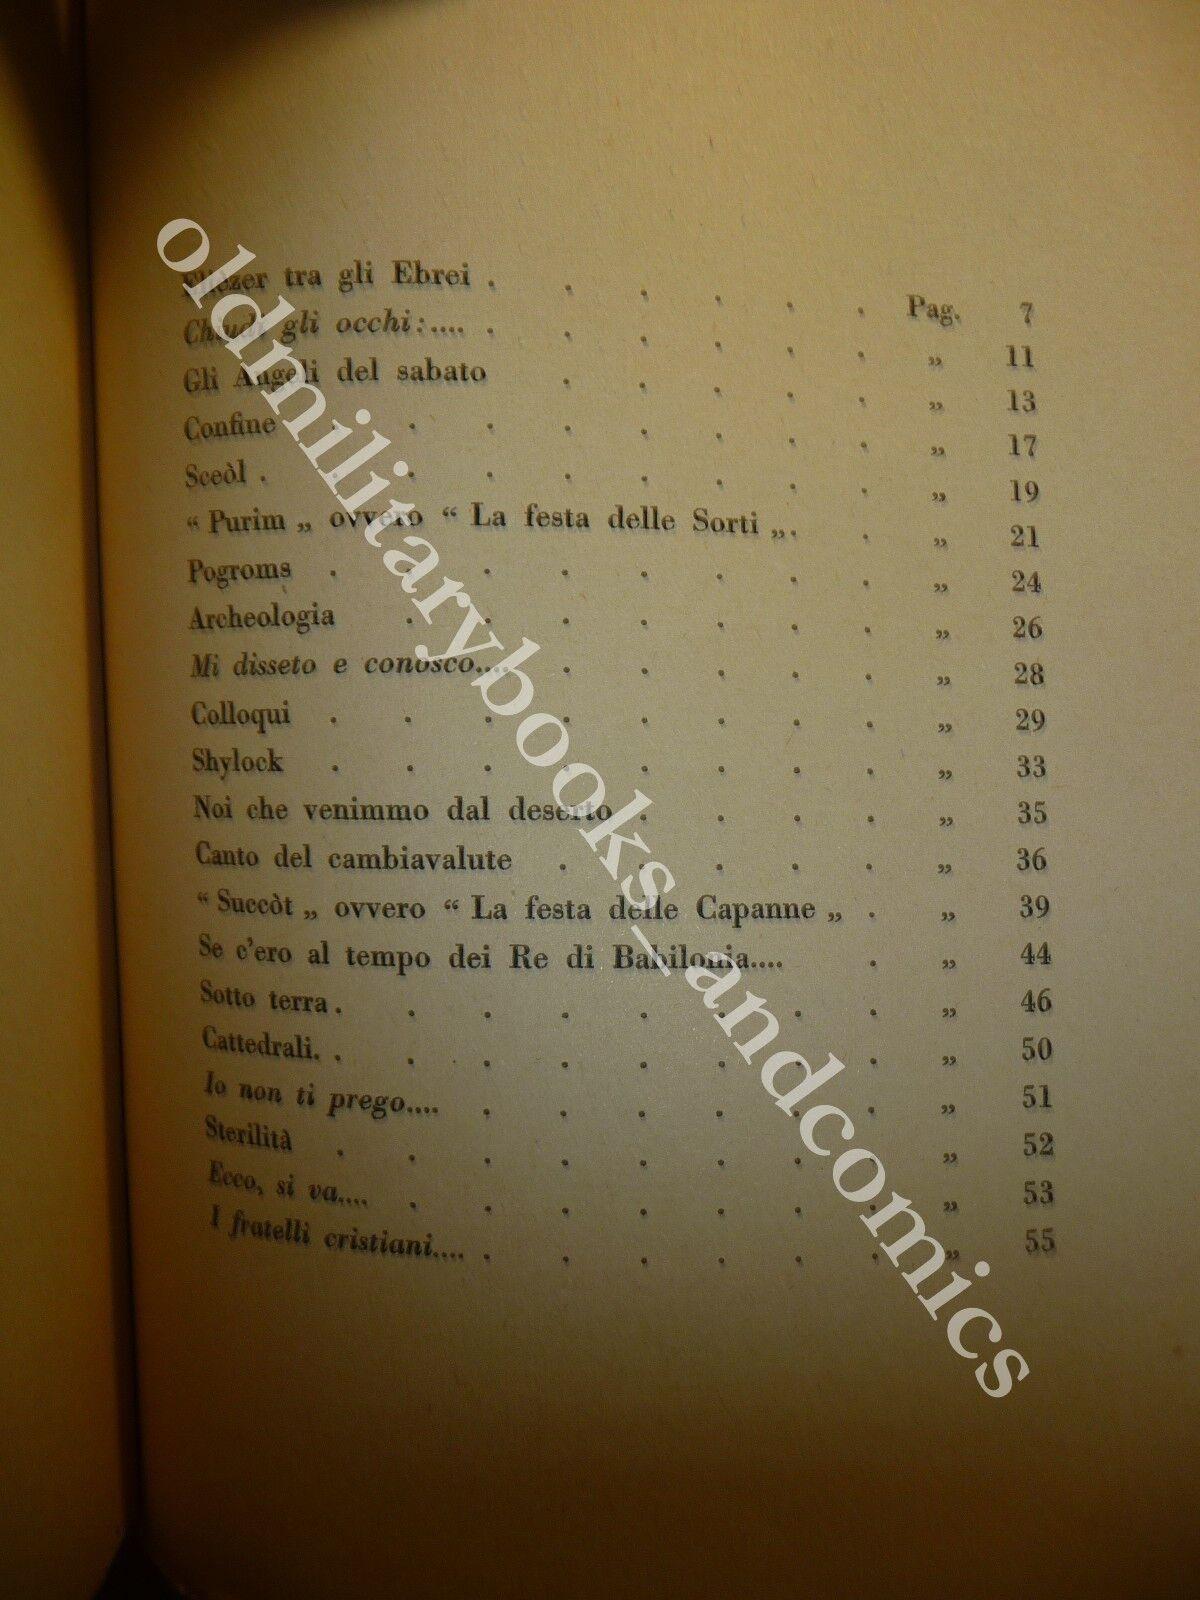 IO EBREO ELIEZER BEN DAVID STORIELLE EBRAICHE 1.000 COPIE NS N 113 BELFORTE 1925